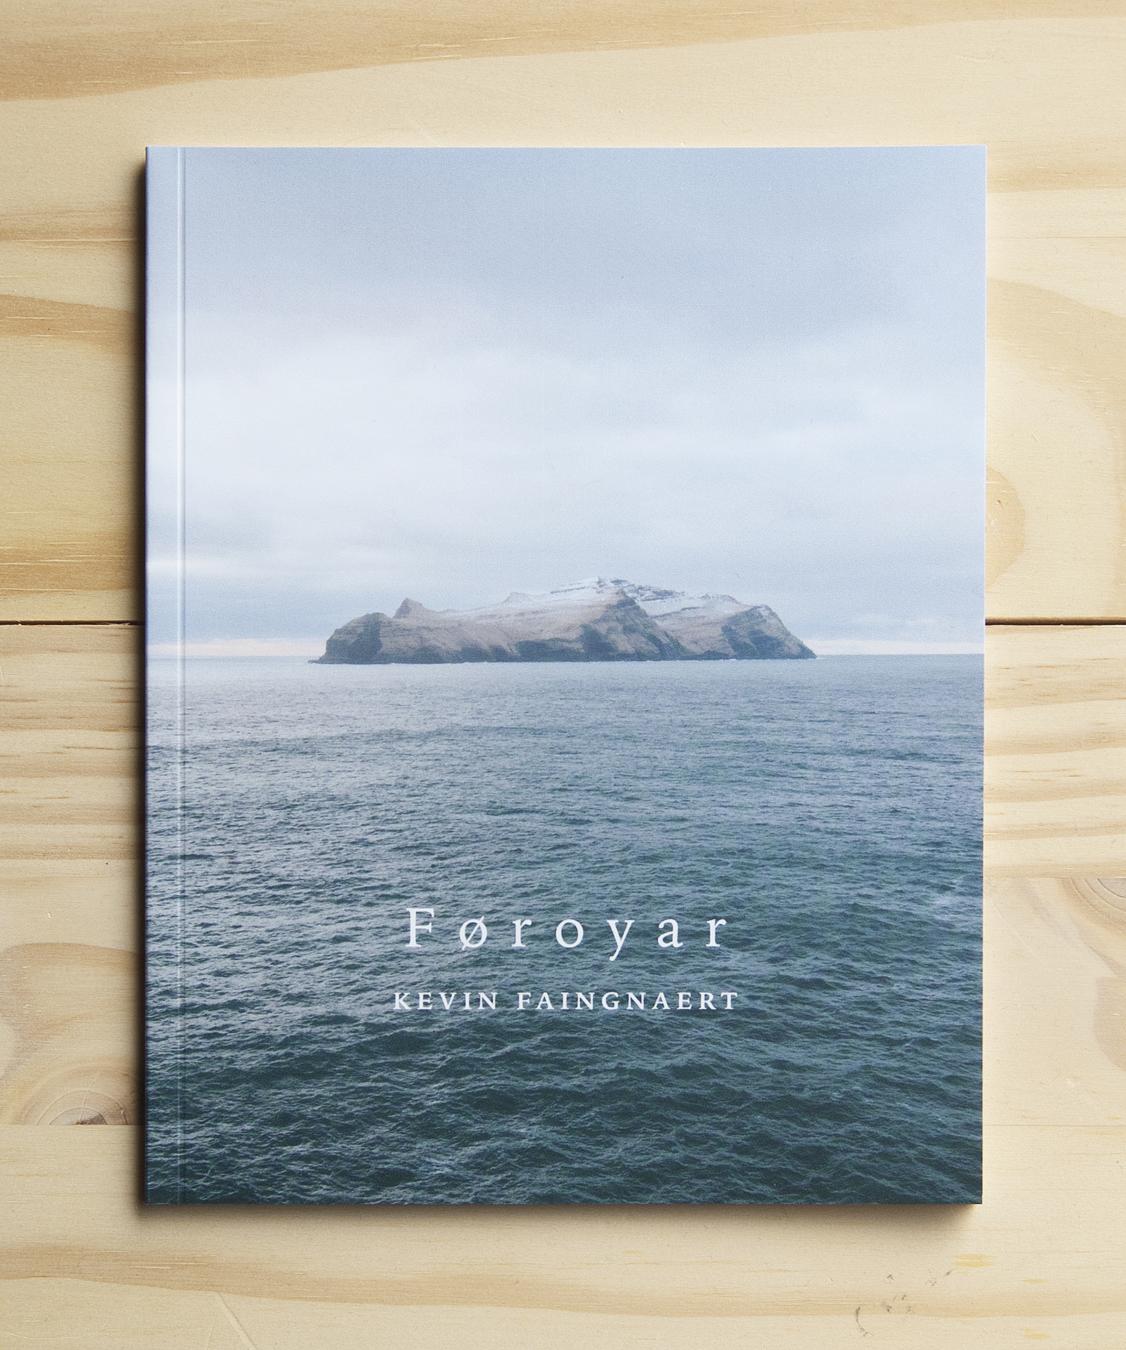 Foroyar  by Kevin Faingnaert